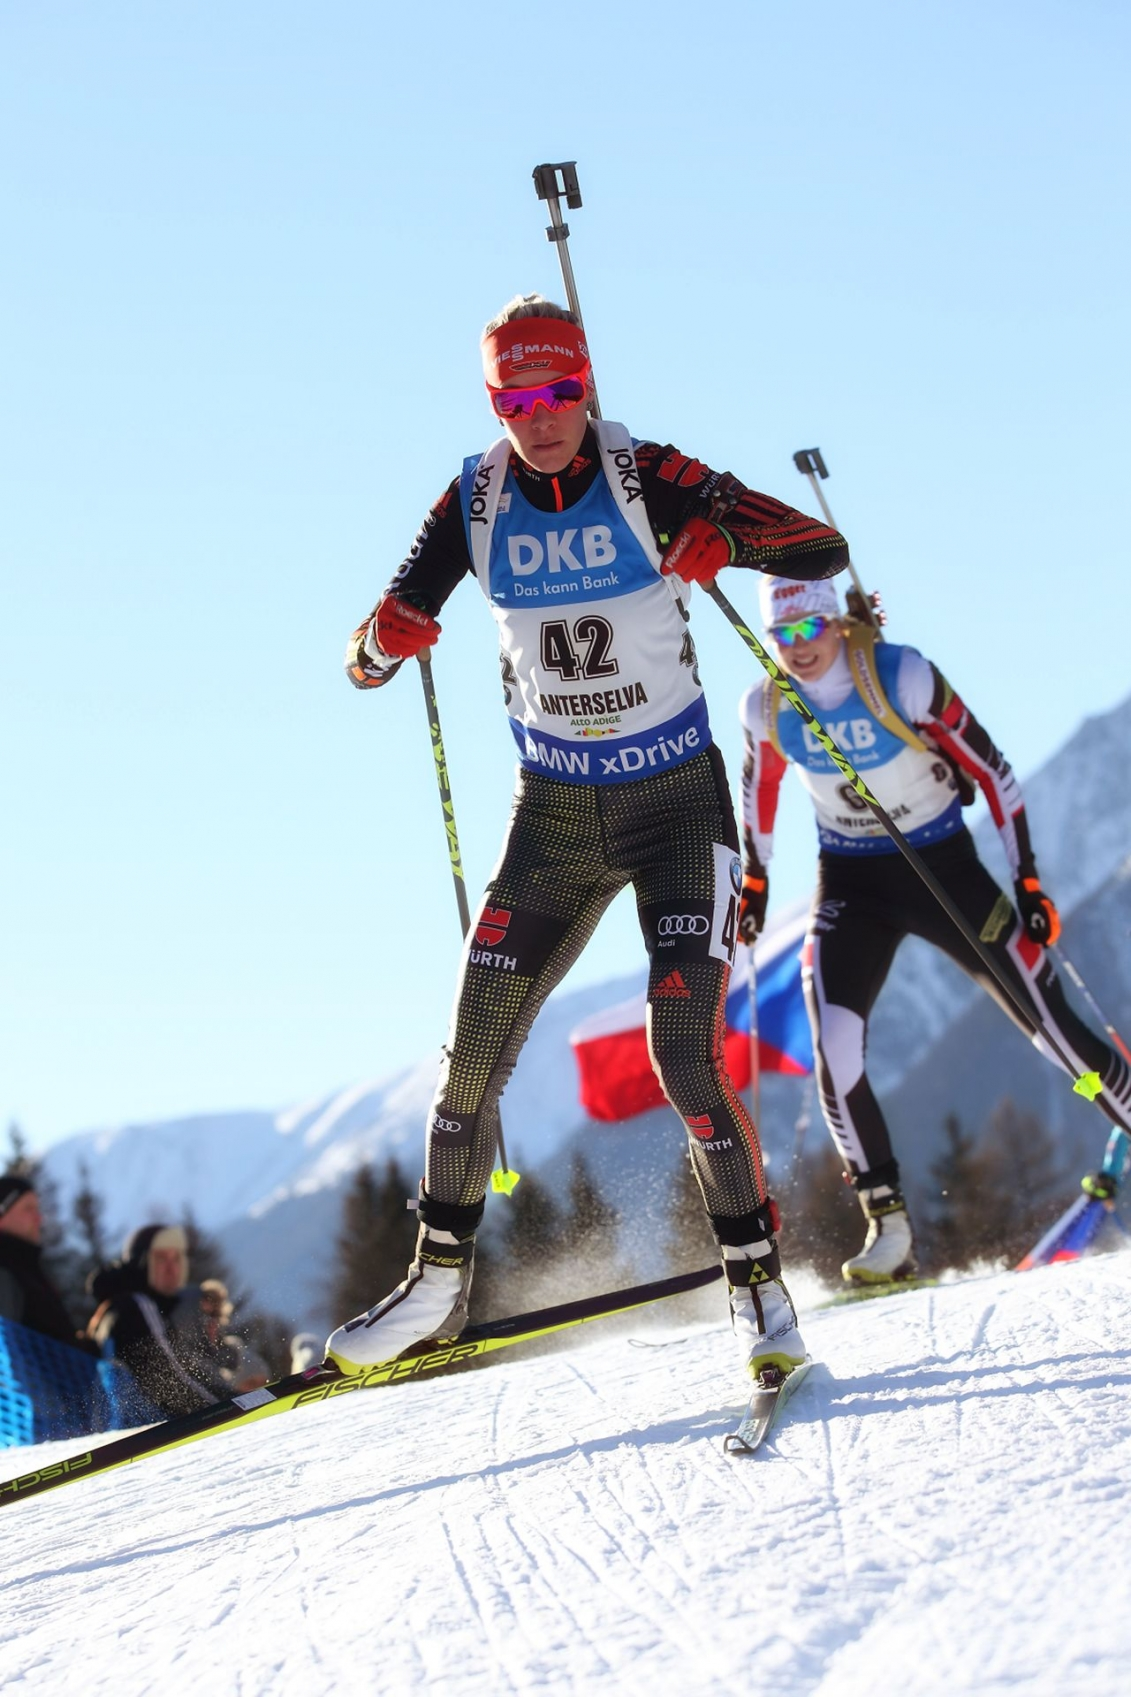 Biathlon Antholz 1 glamour 1131x1697 - Sports